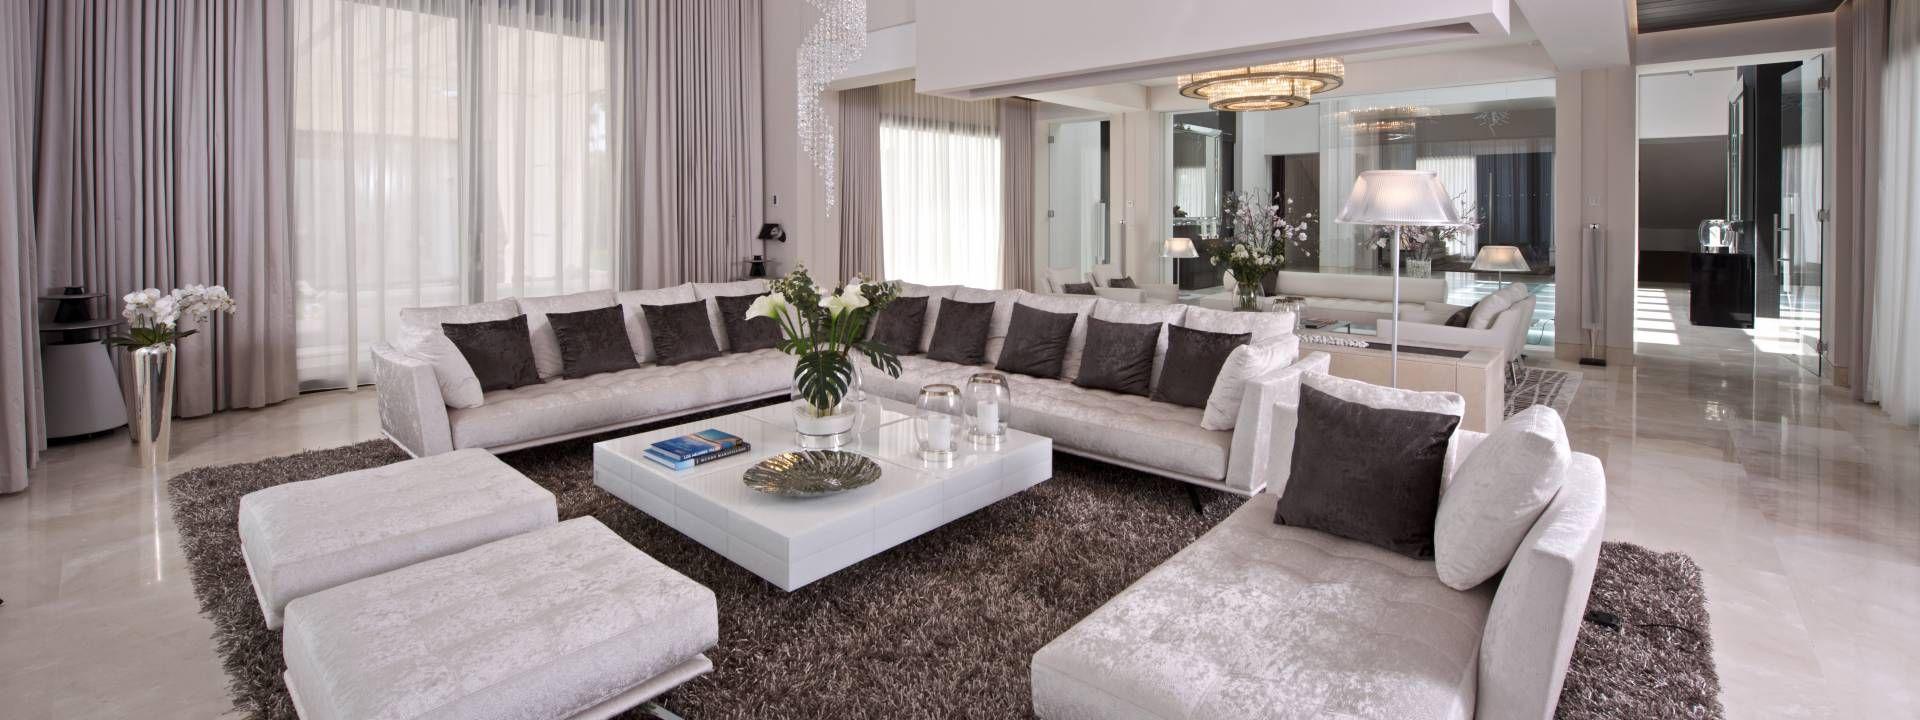 Interior Design Luxury Homes Mansion Villa  Google Search  Home Adorable Luxury Modern Living Room Design Decorating Design